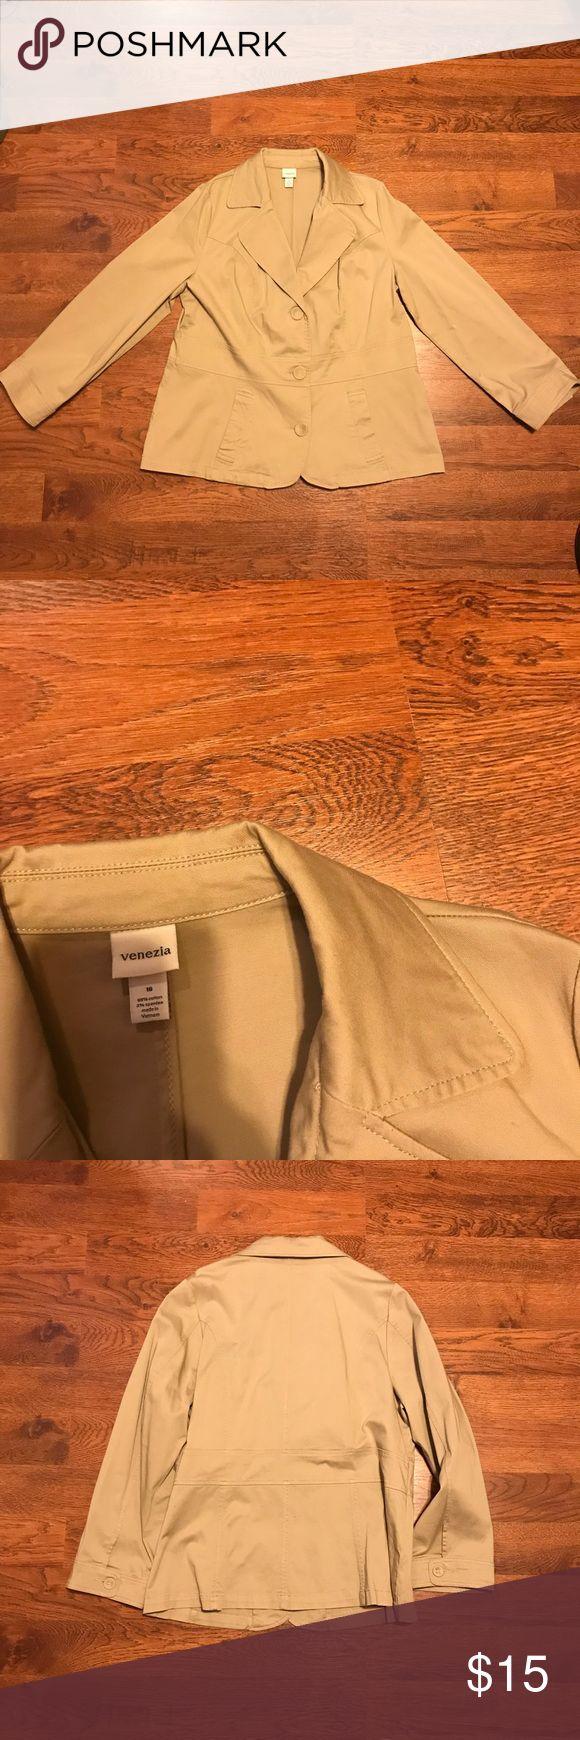 Beige blazer Moving Sale! Everything must go!   Nice beige blazer size 16, in perfect condition. Jackets & Coats Blazers